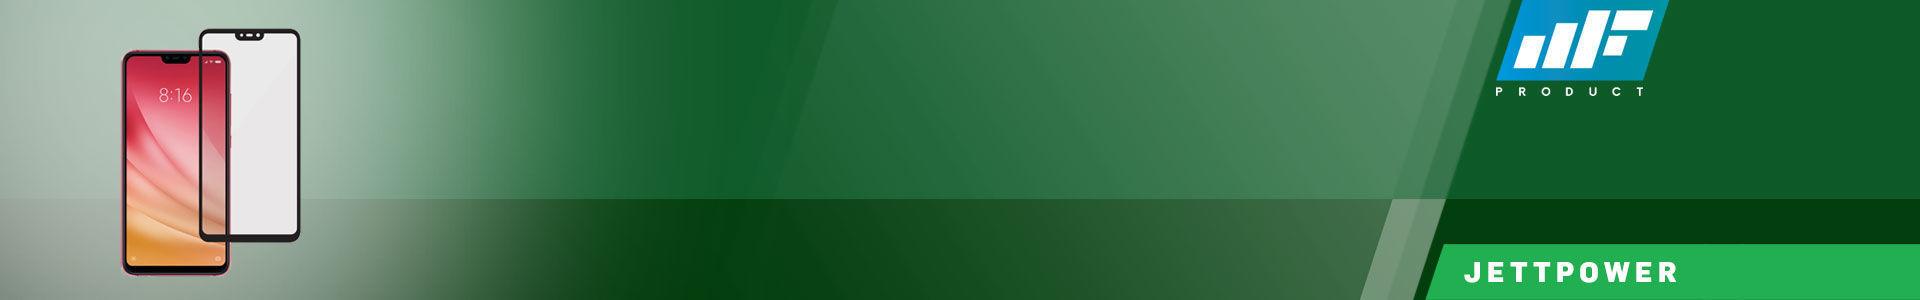 MF Product Jettpower 0441 Renklı Ekran Koruyucu Cam Xiaomi Mi 8 Lite hemen al hemen gelsin!